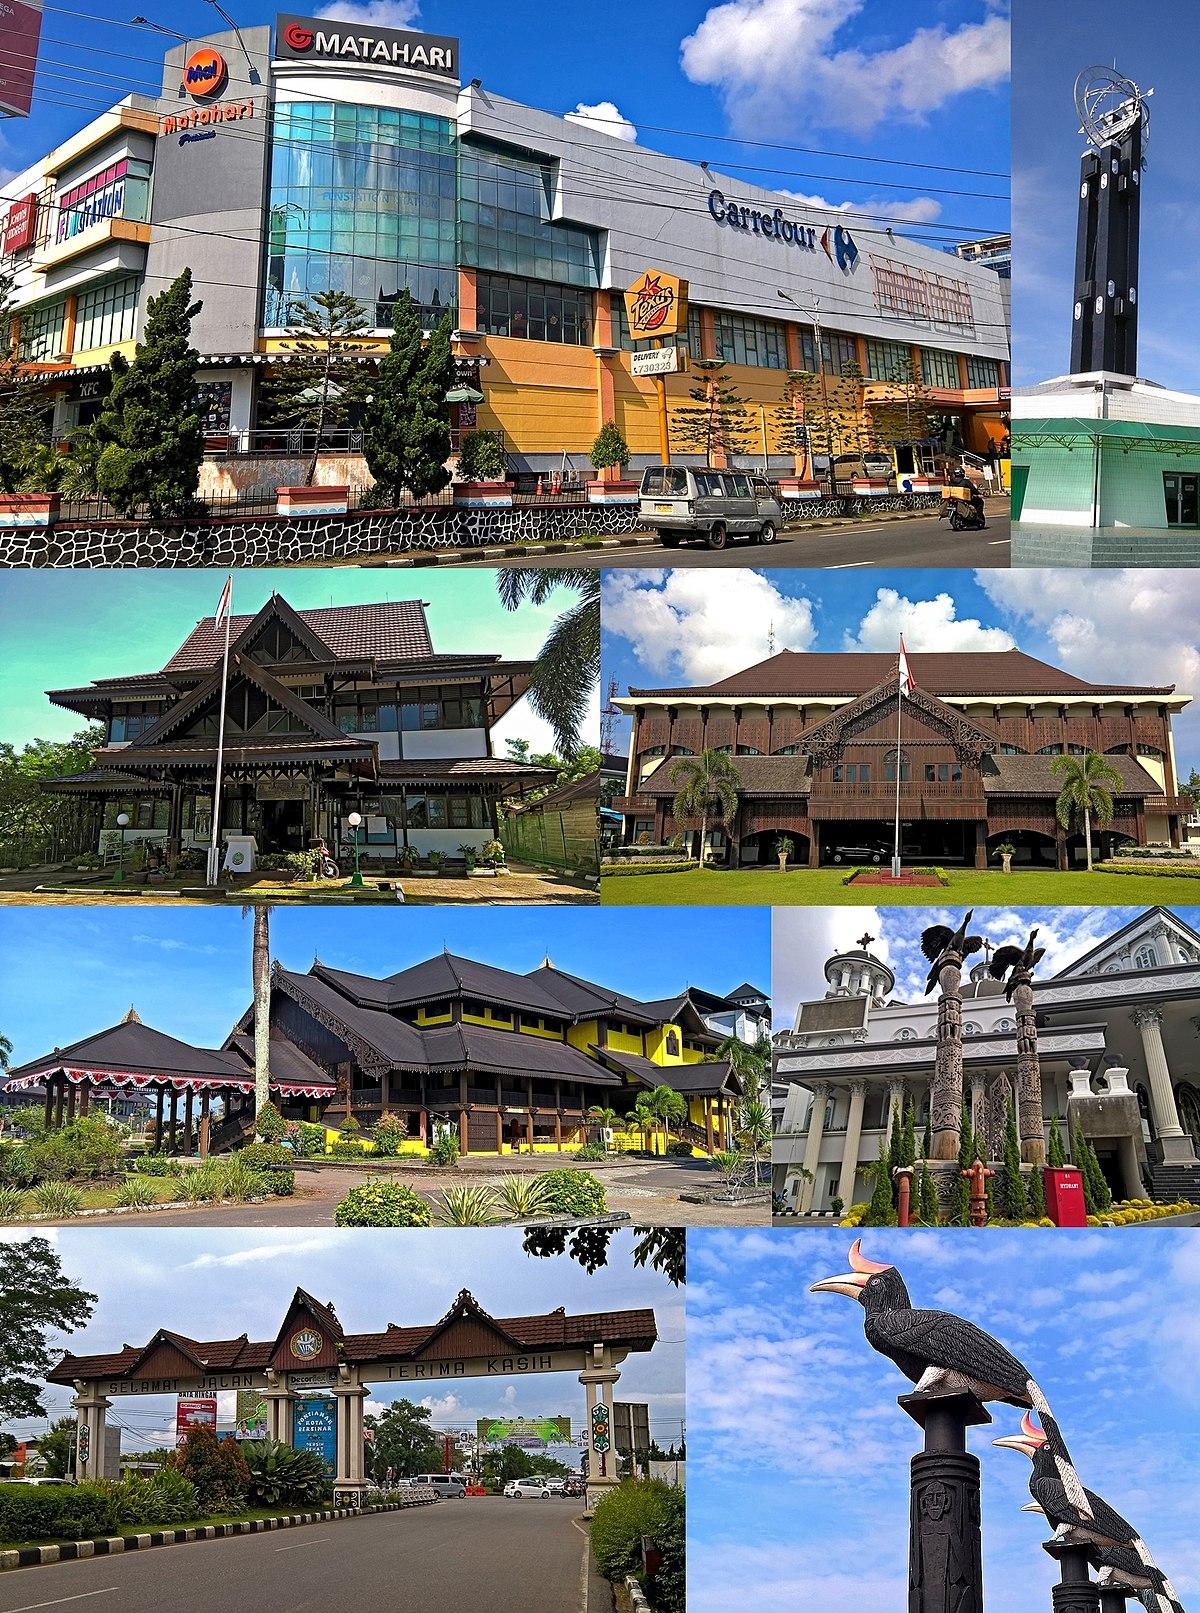 Pontianak Indonesia Wikipedia Musium Kalimantan Barat Kab